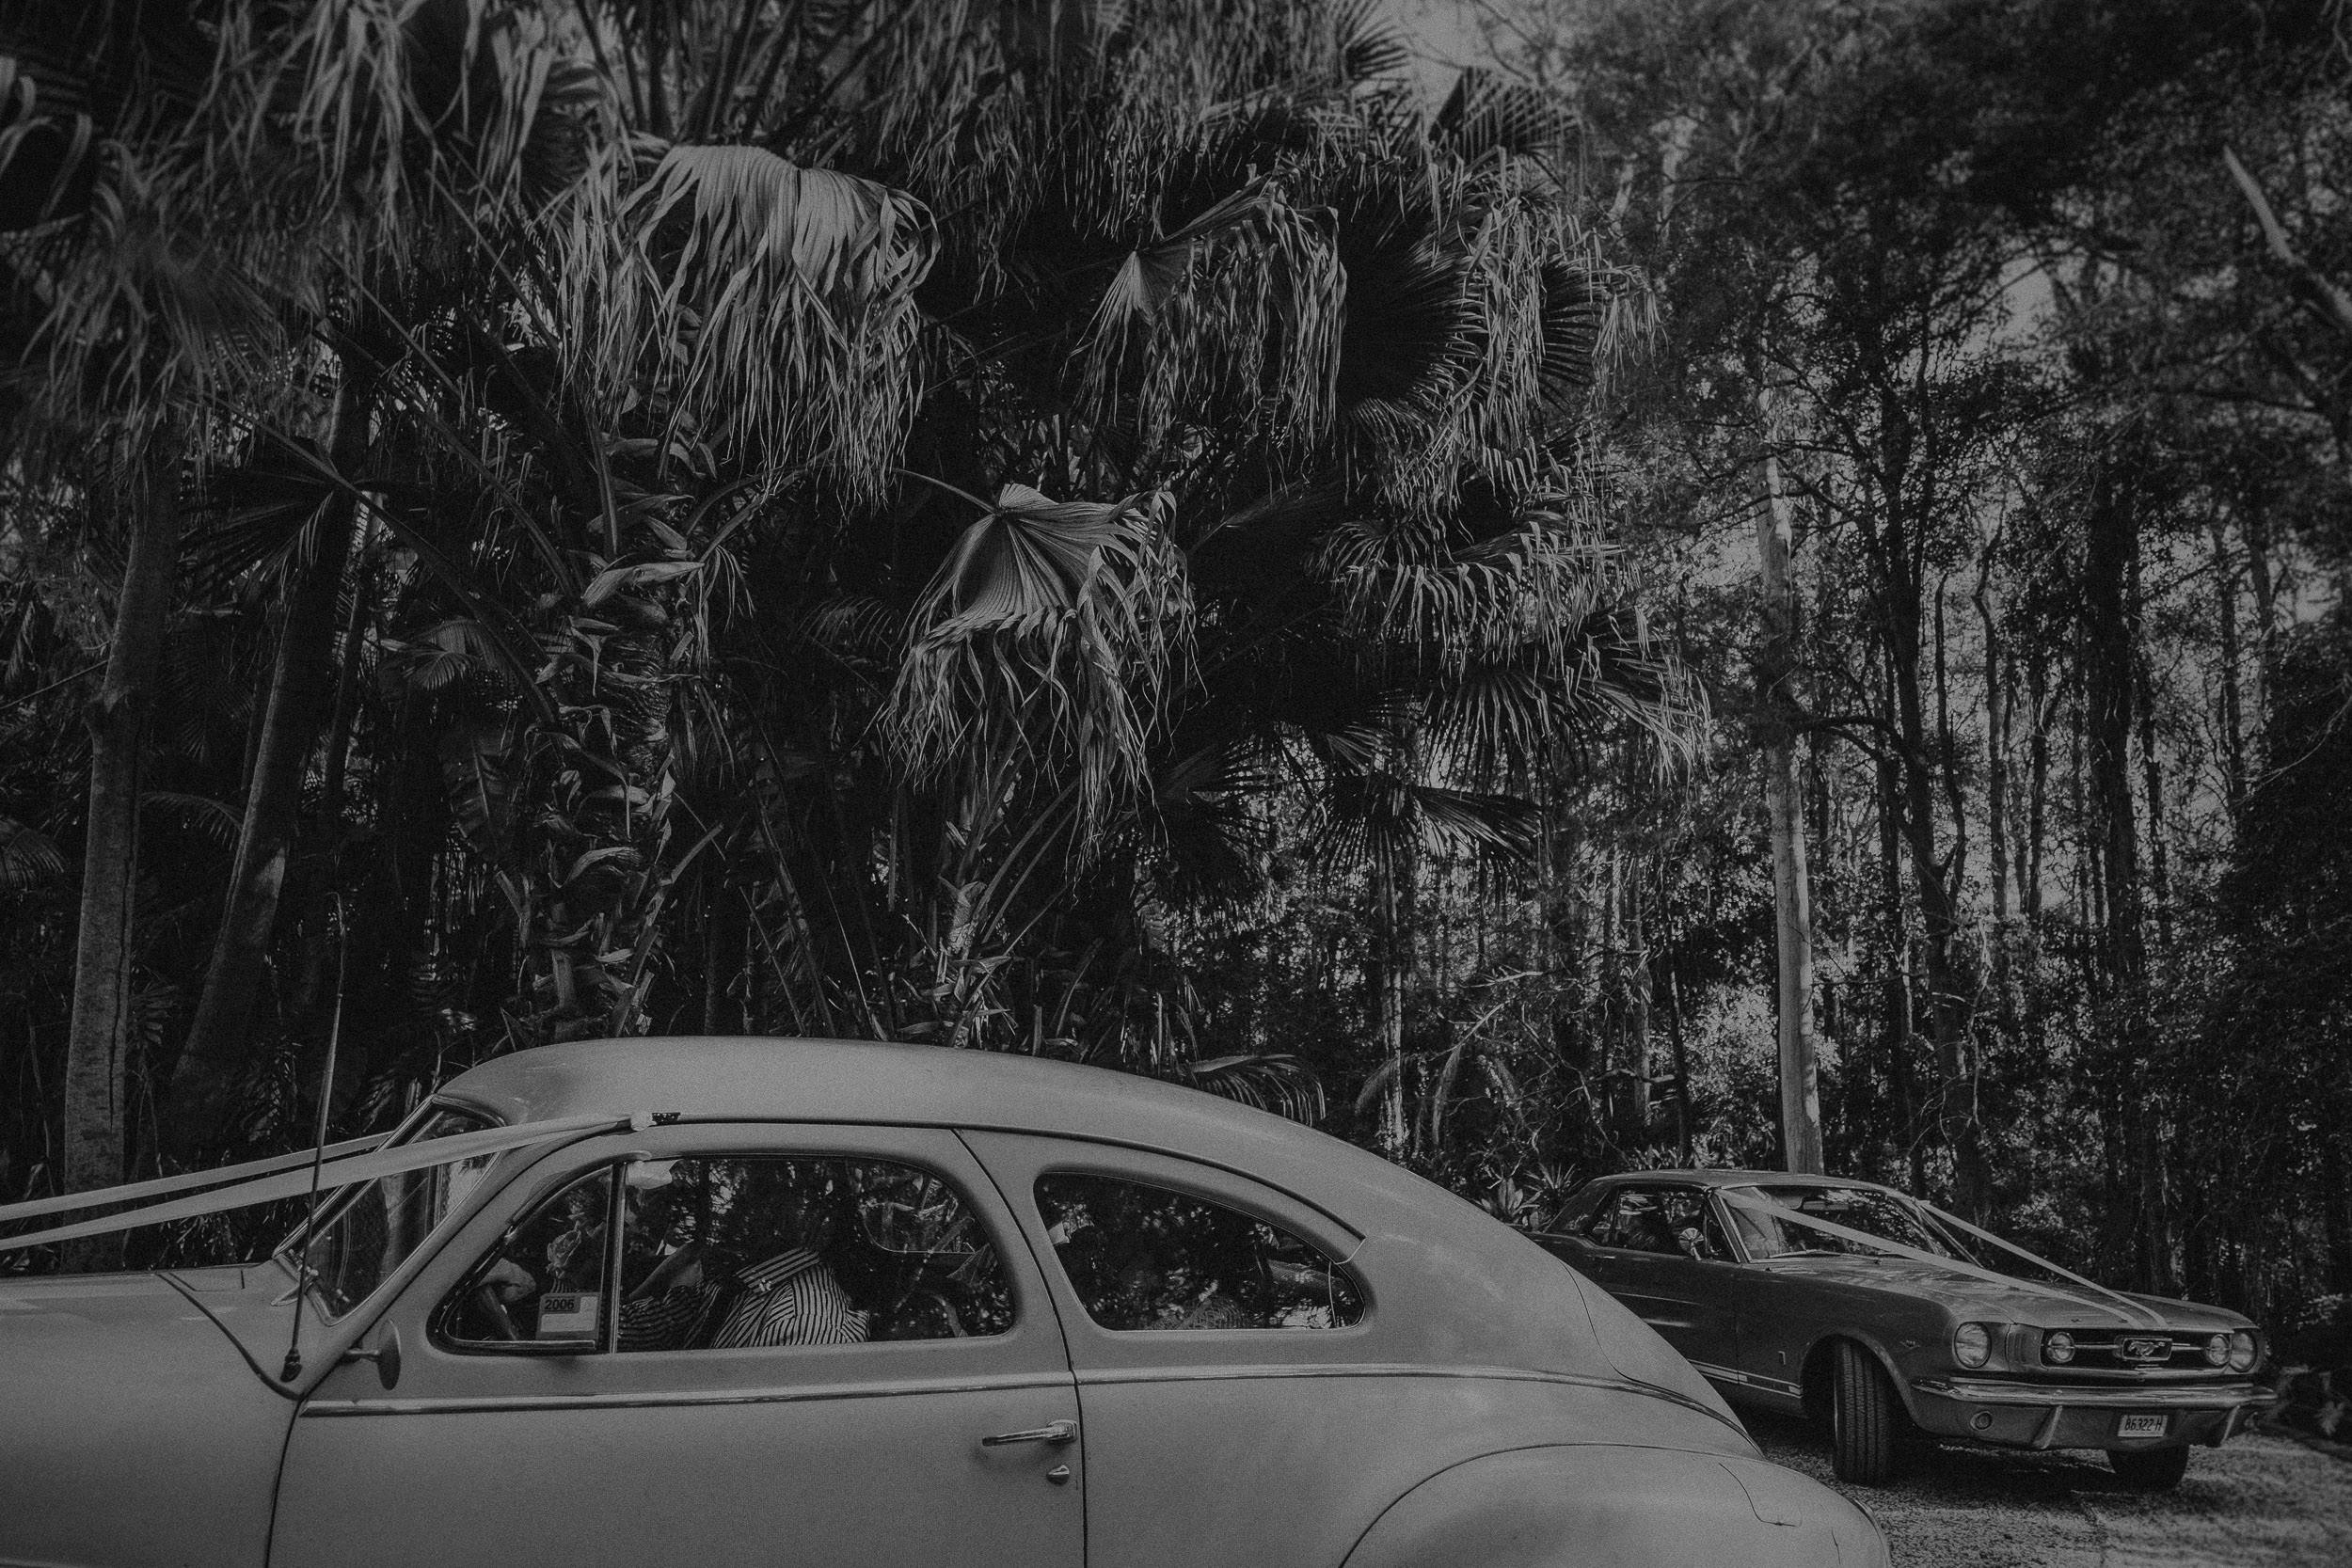 S&A Elopement - Kings & Thieves - Shred 'Til Dead - Central Coast Beach Forest Wedding - 144.jpg